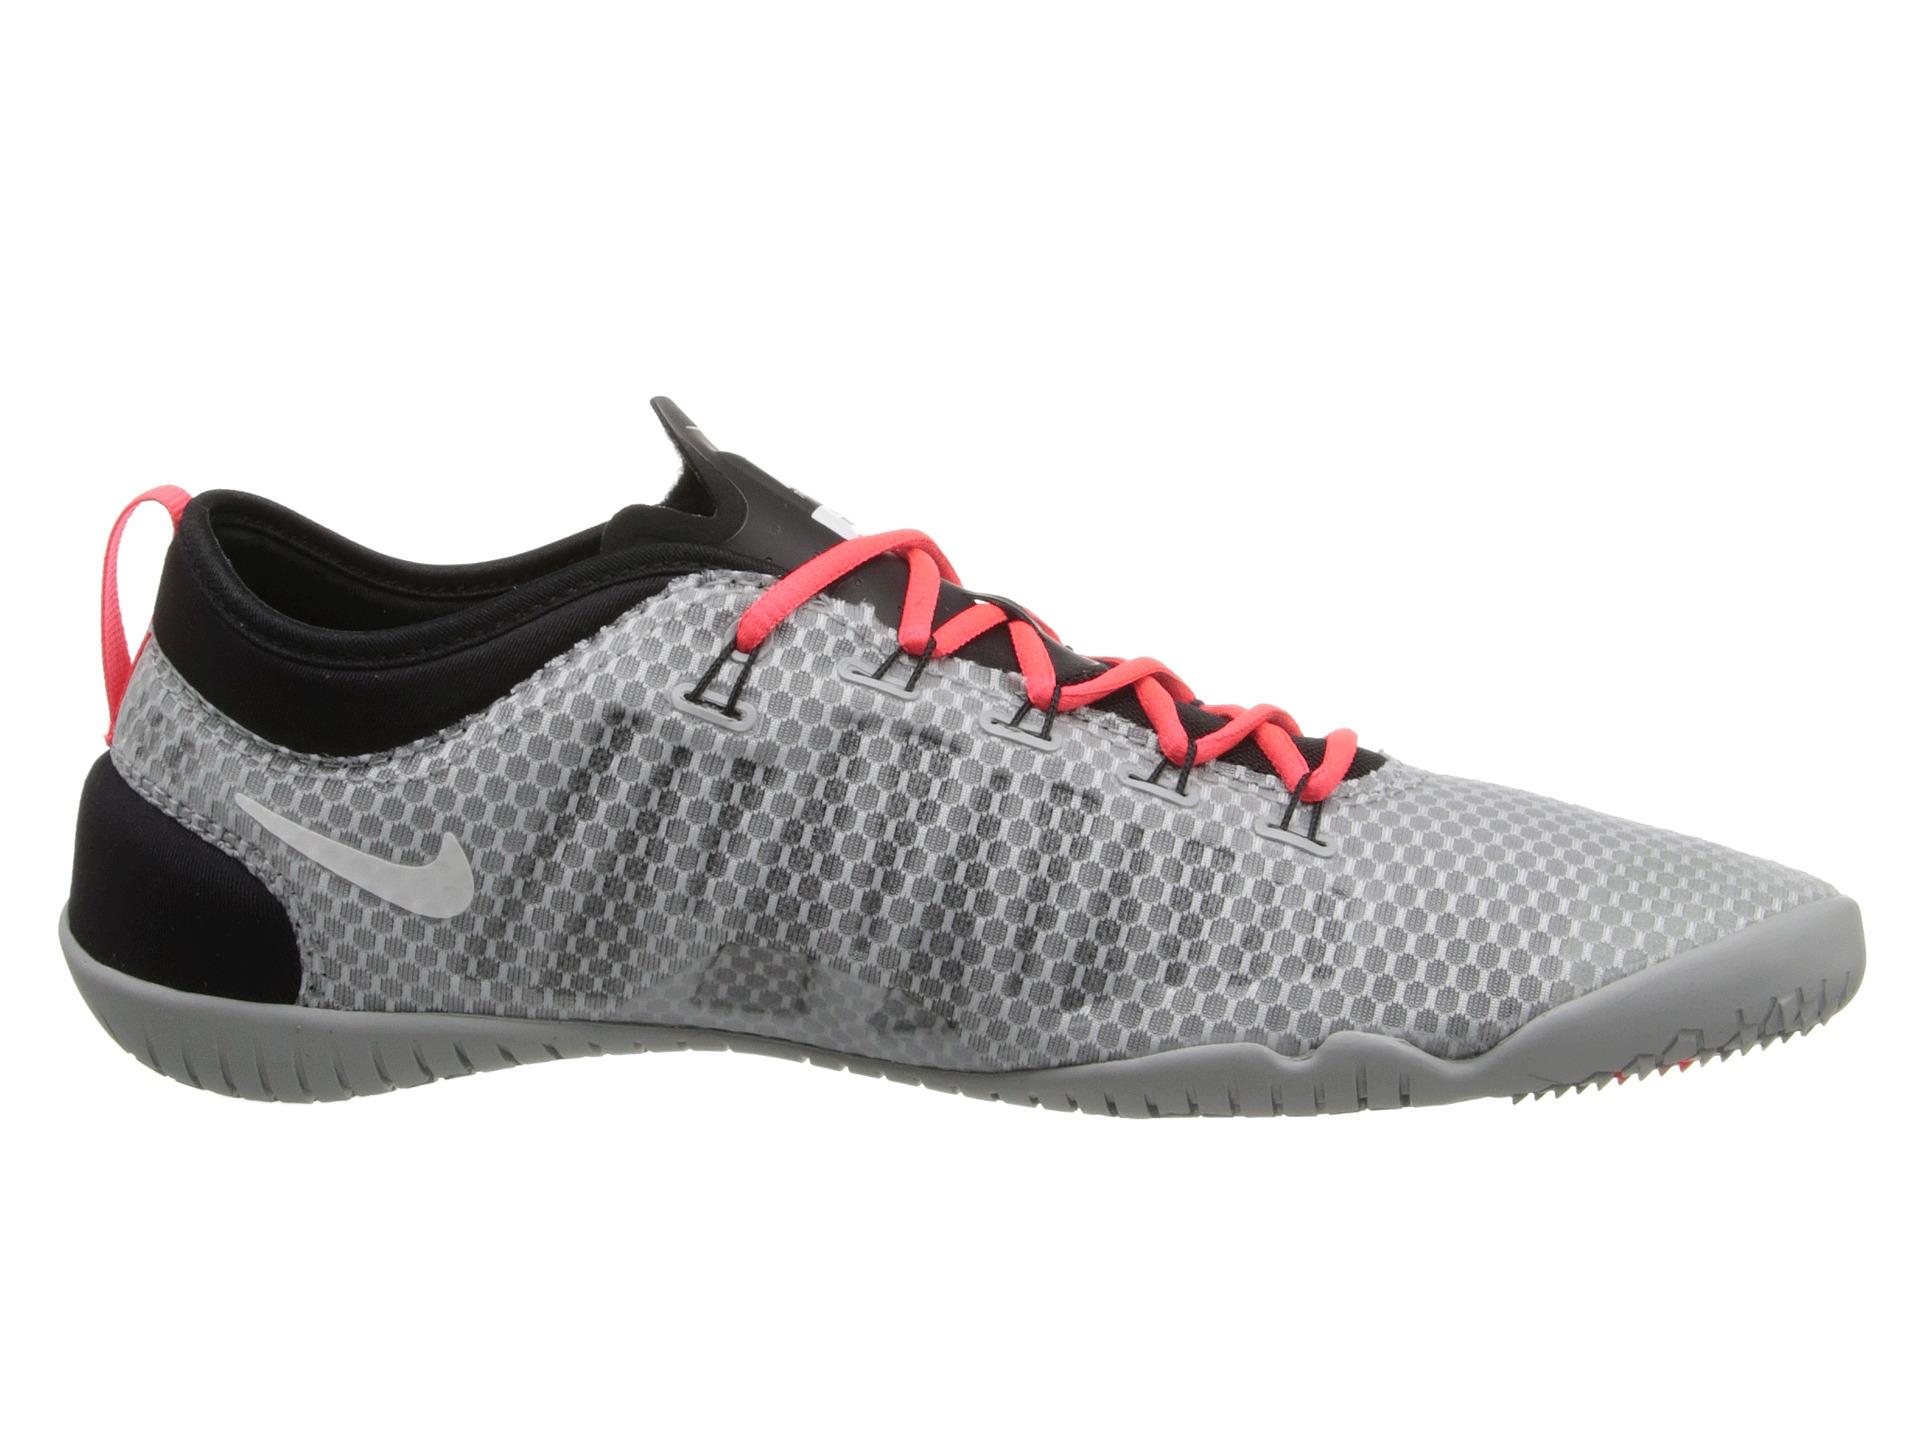 Nike Free Bionic Training Shoes Review